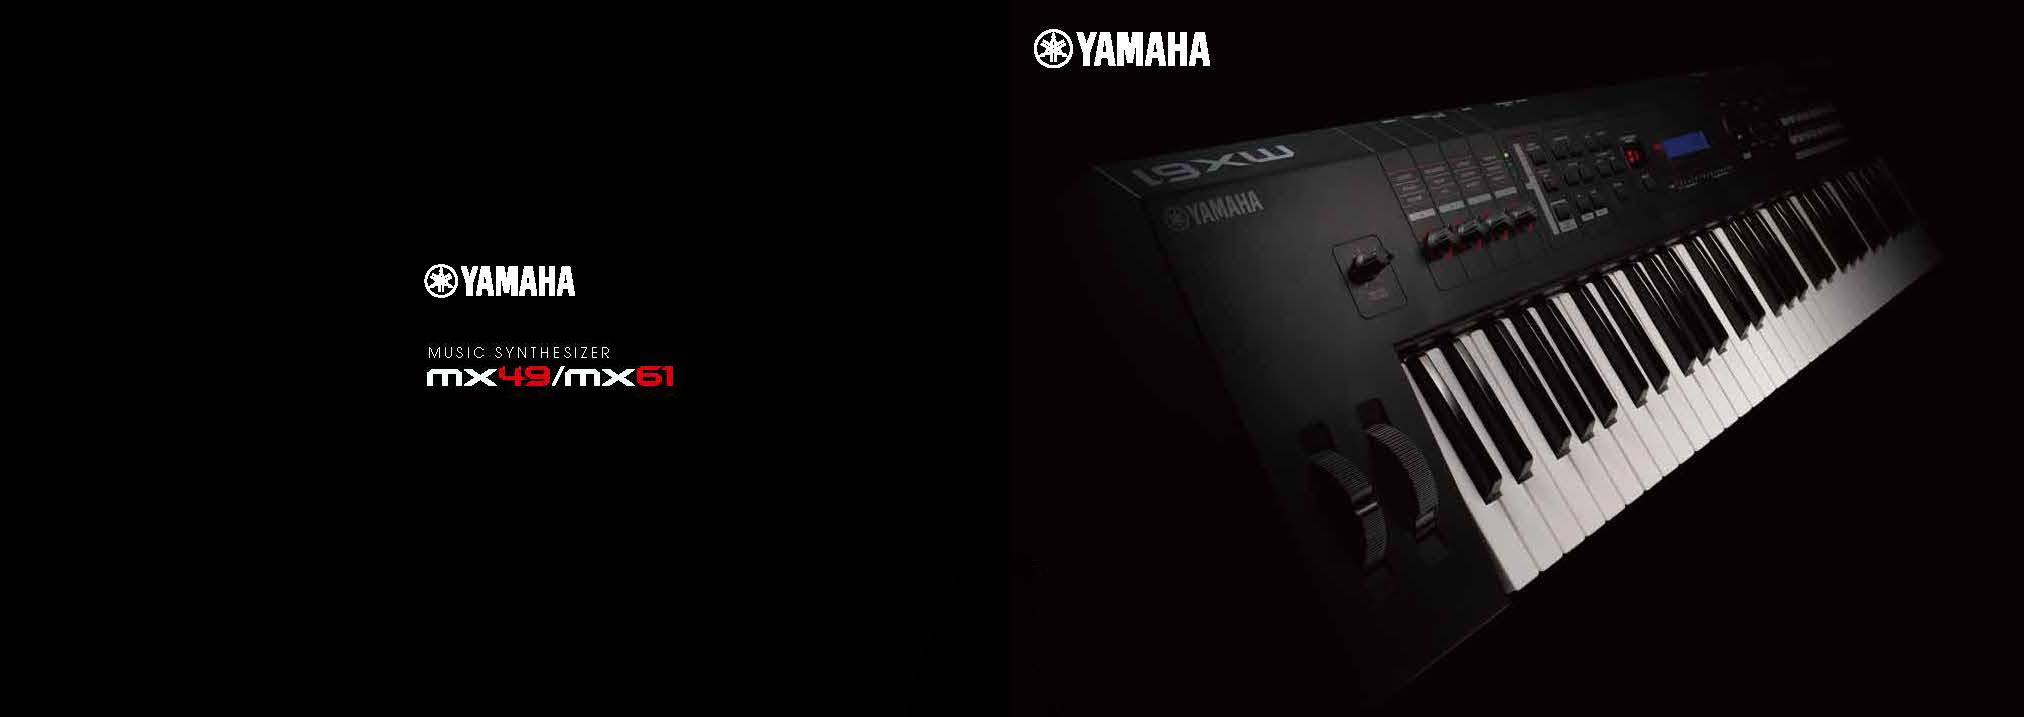 yamaha mx series synthesizer keyboard